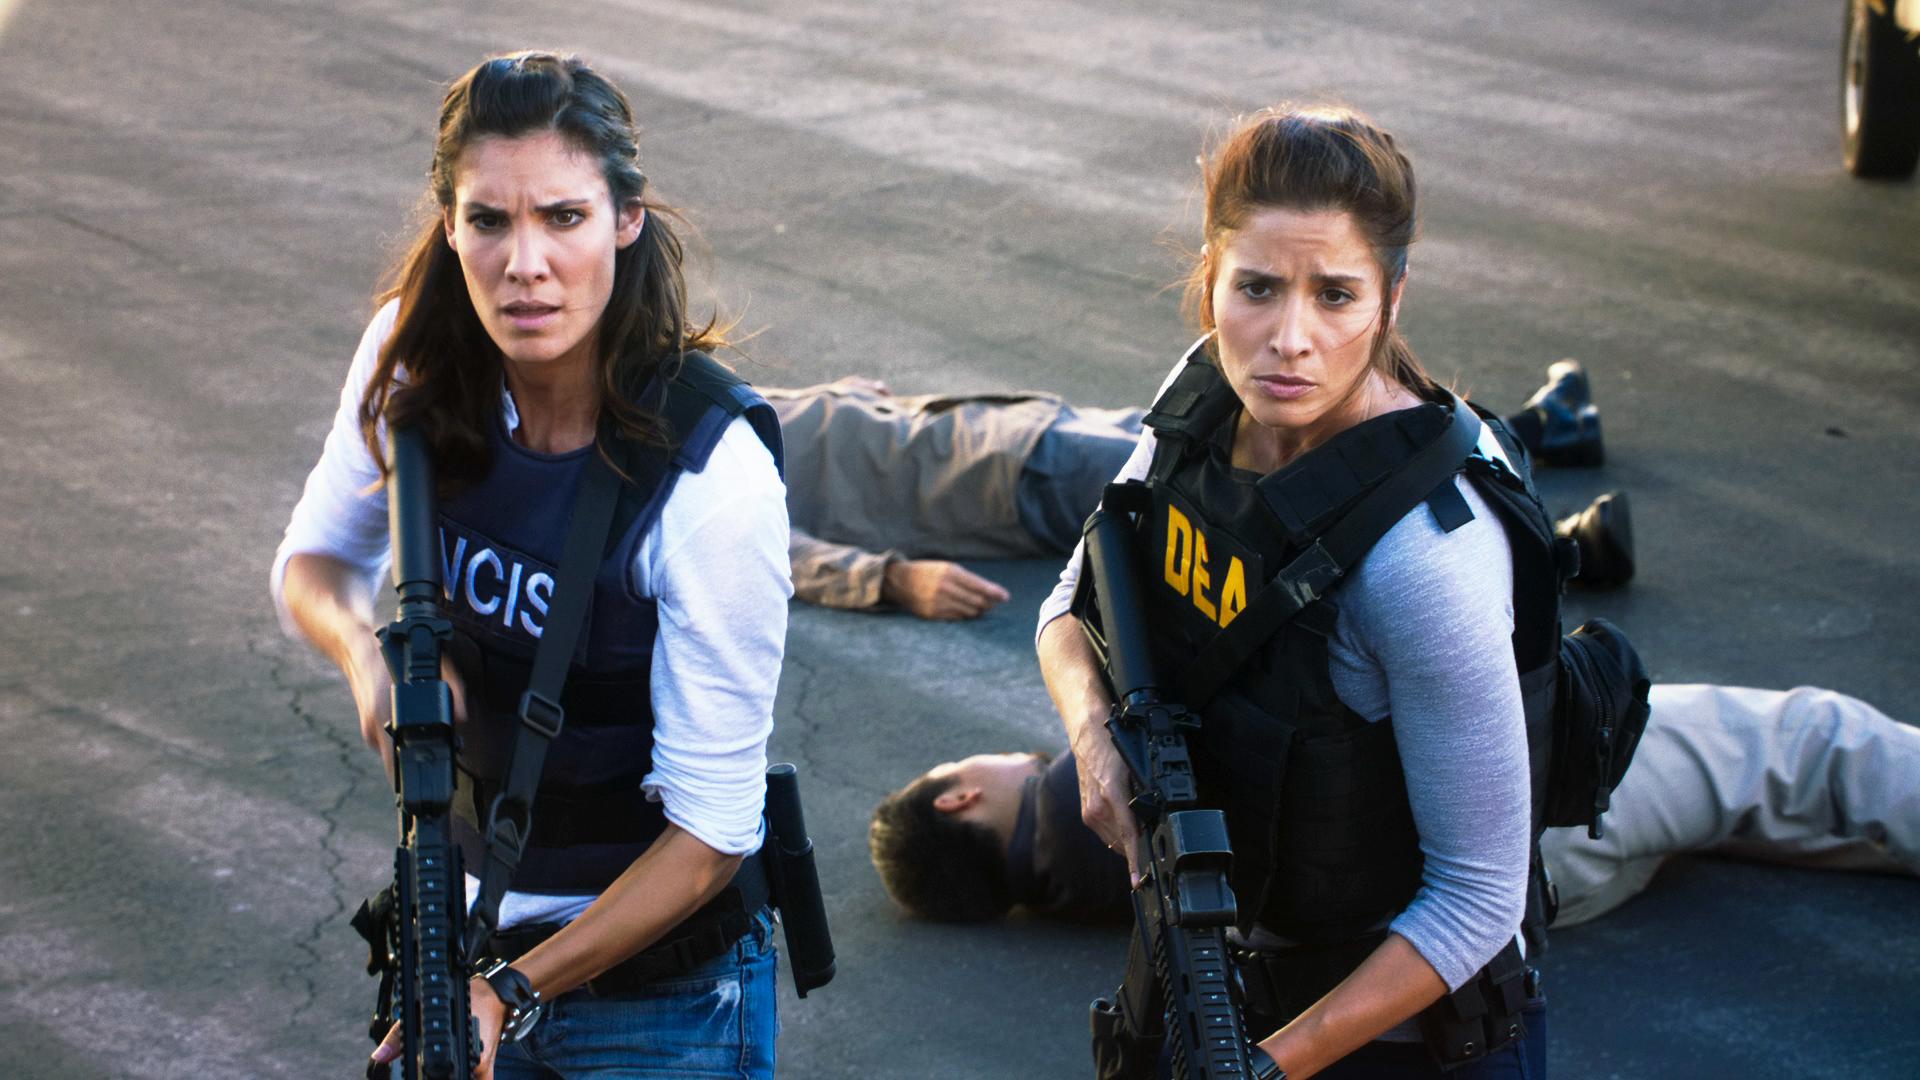 NCIS: Los Angeles Season 8 Promo 1